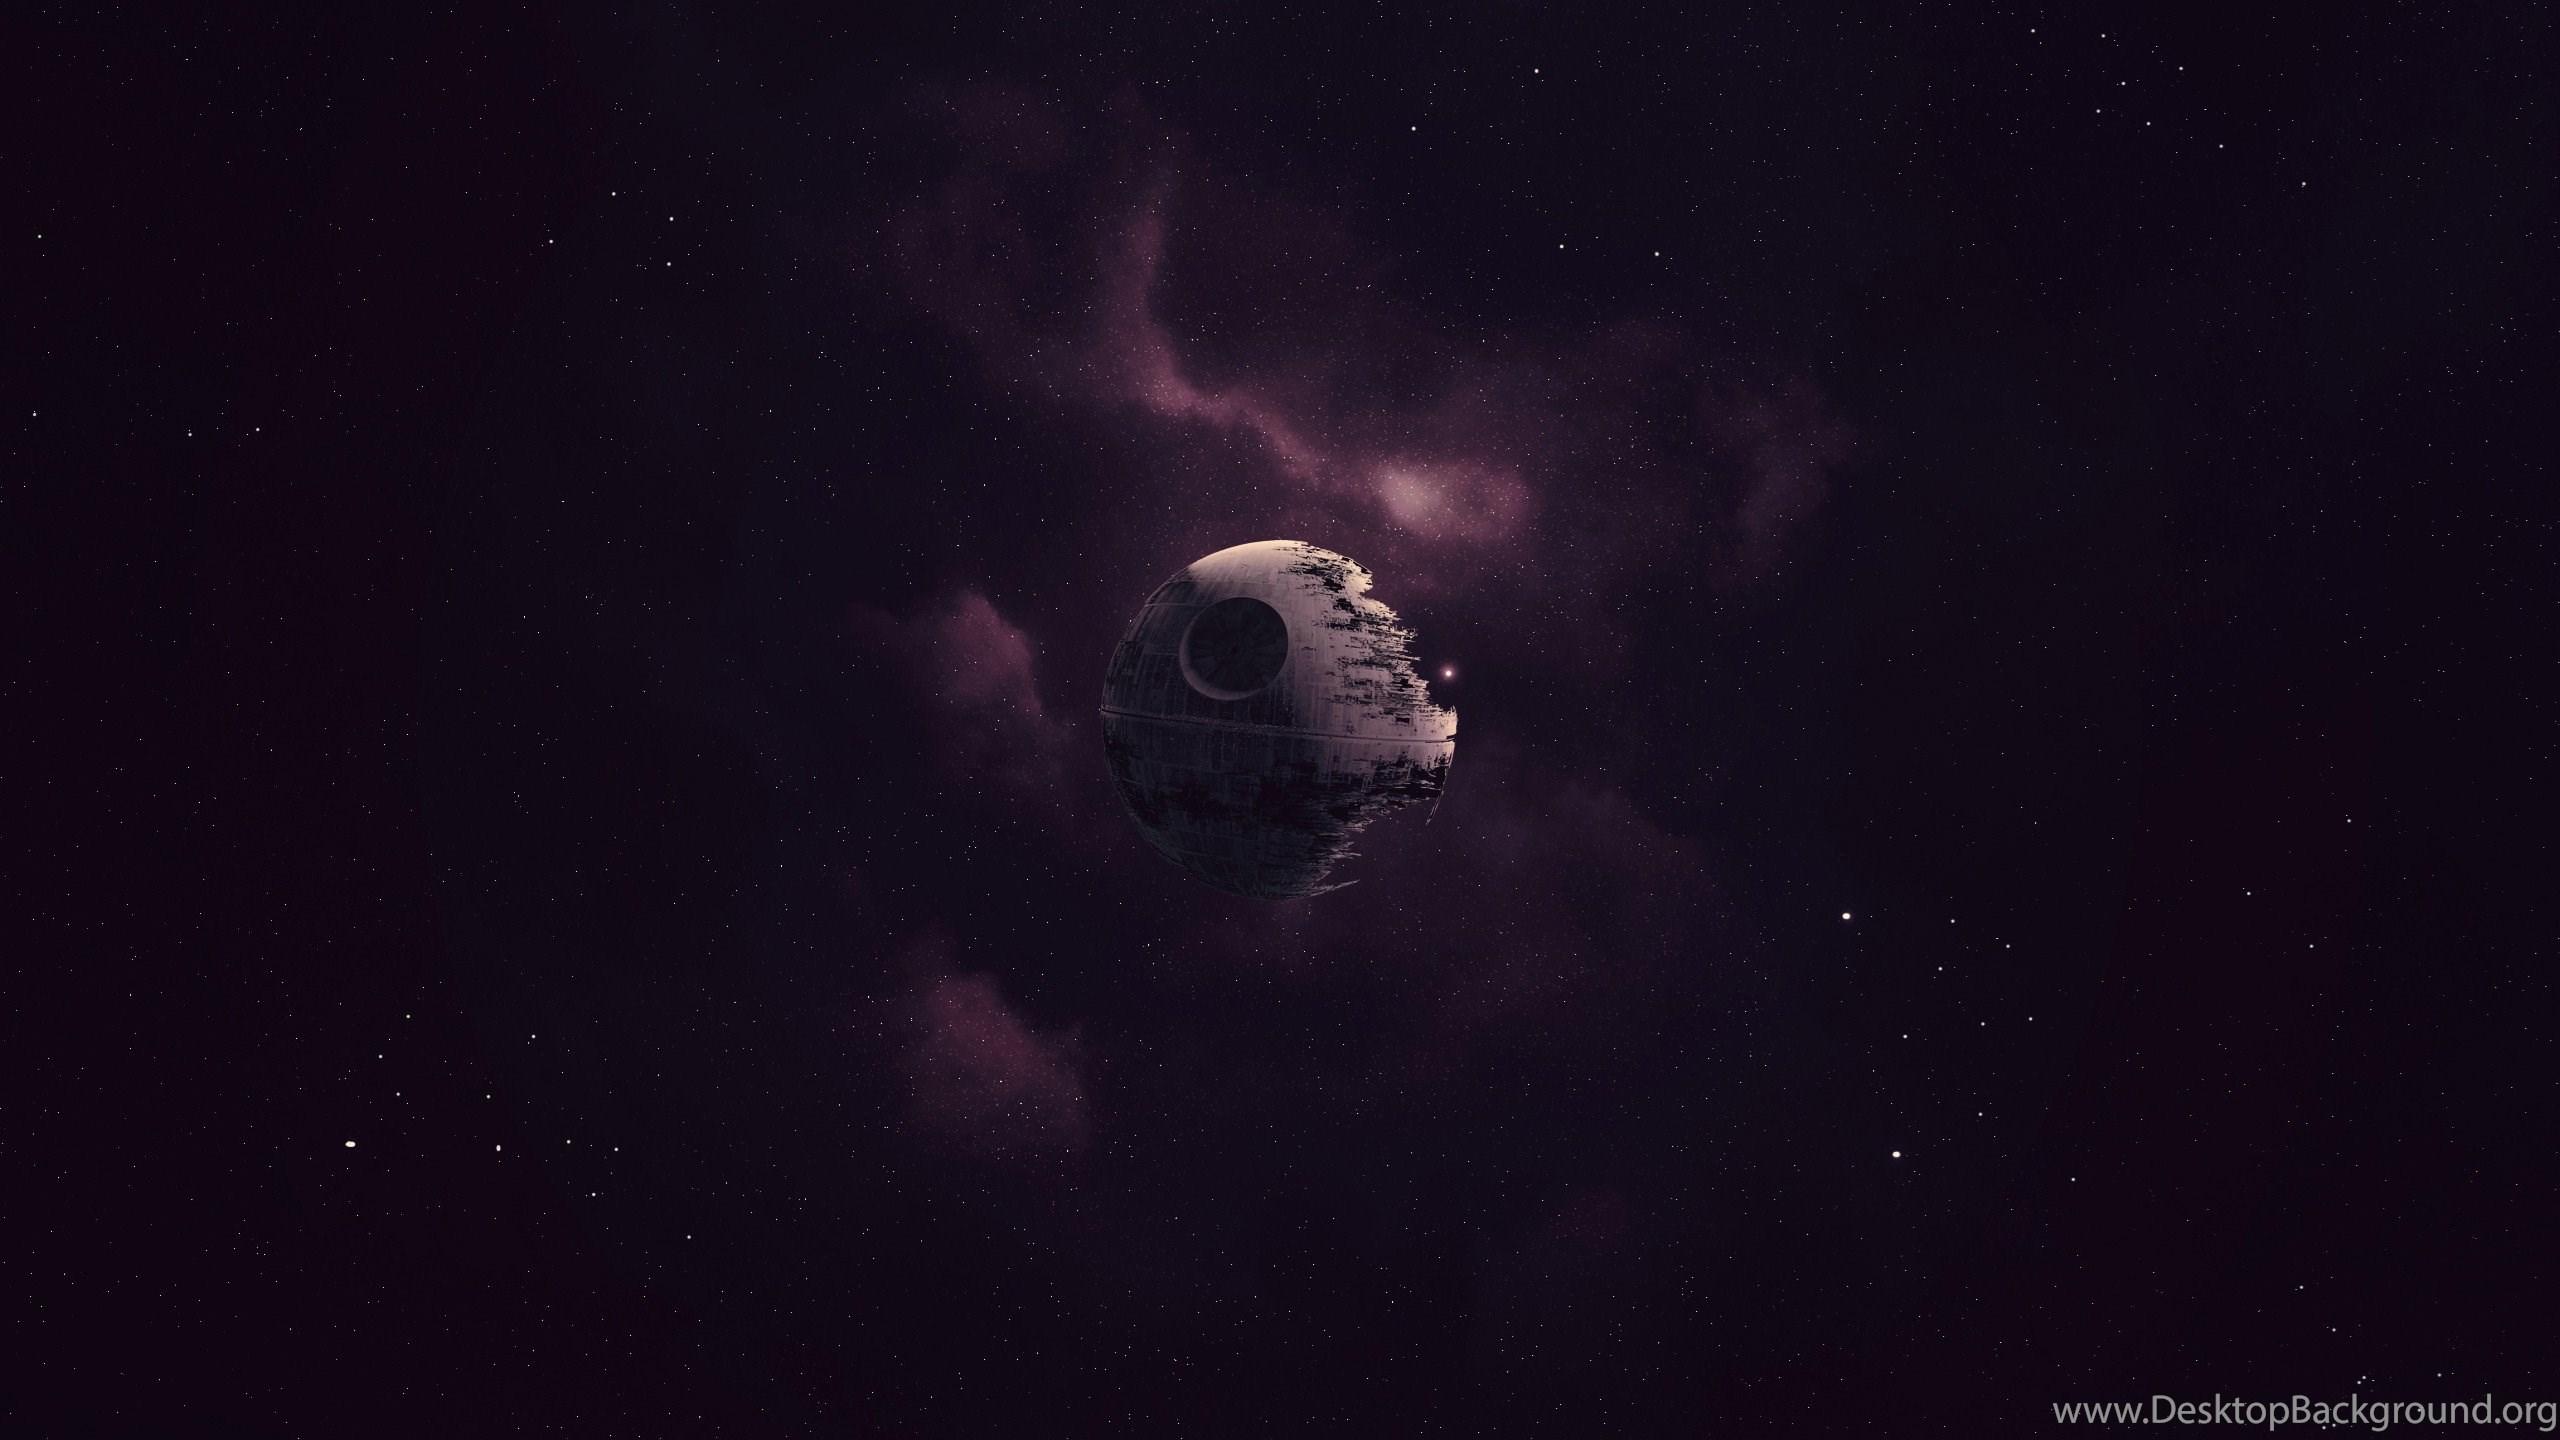 Star Wars Death Star Artwork Space Purple Wallpapers Hd